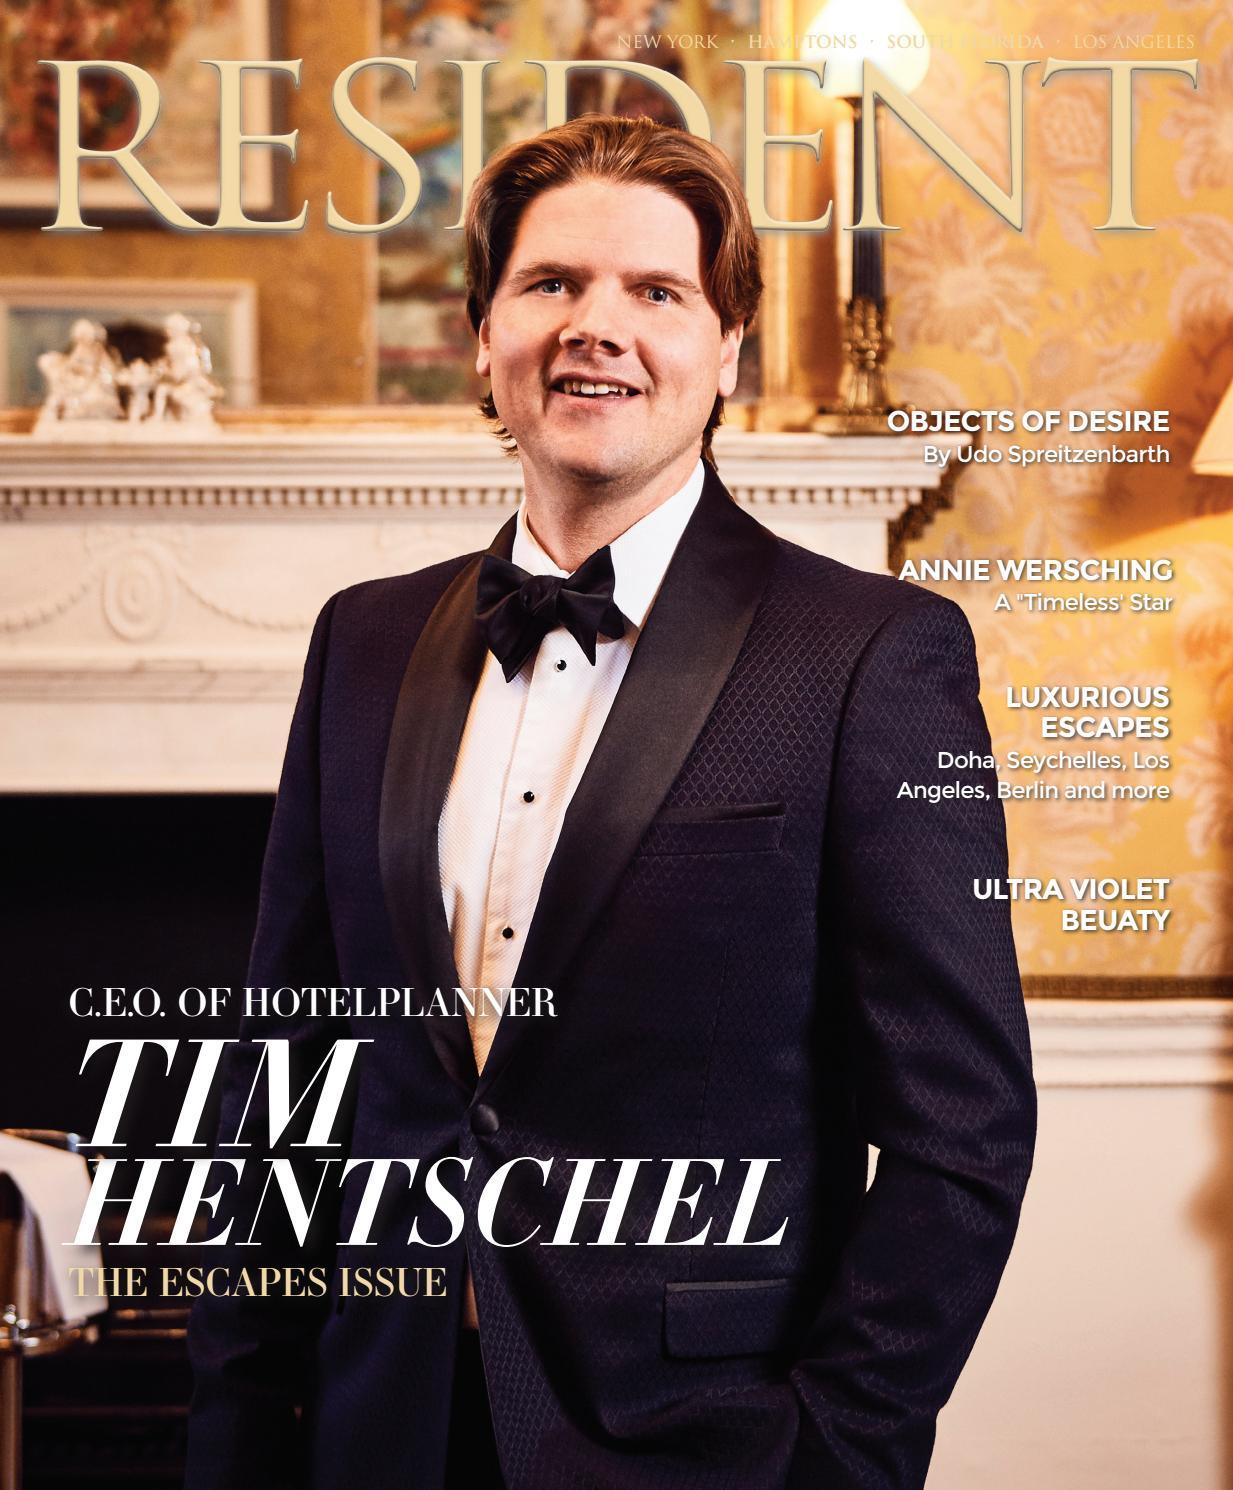 932489d4d81 Resident Magazine February 2018 Issue - Tim Hentschel by Resident Magazine  - issuu